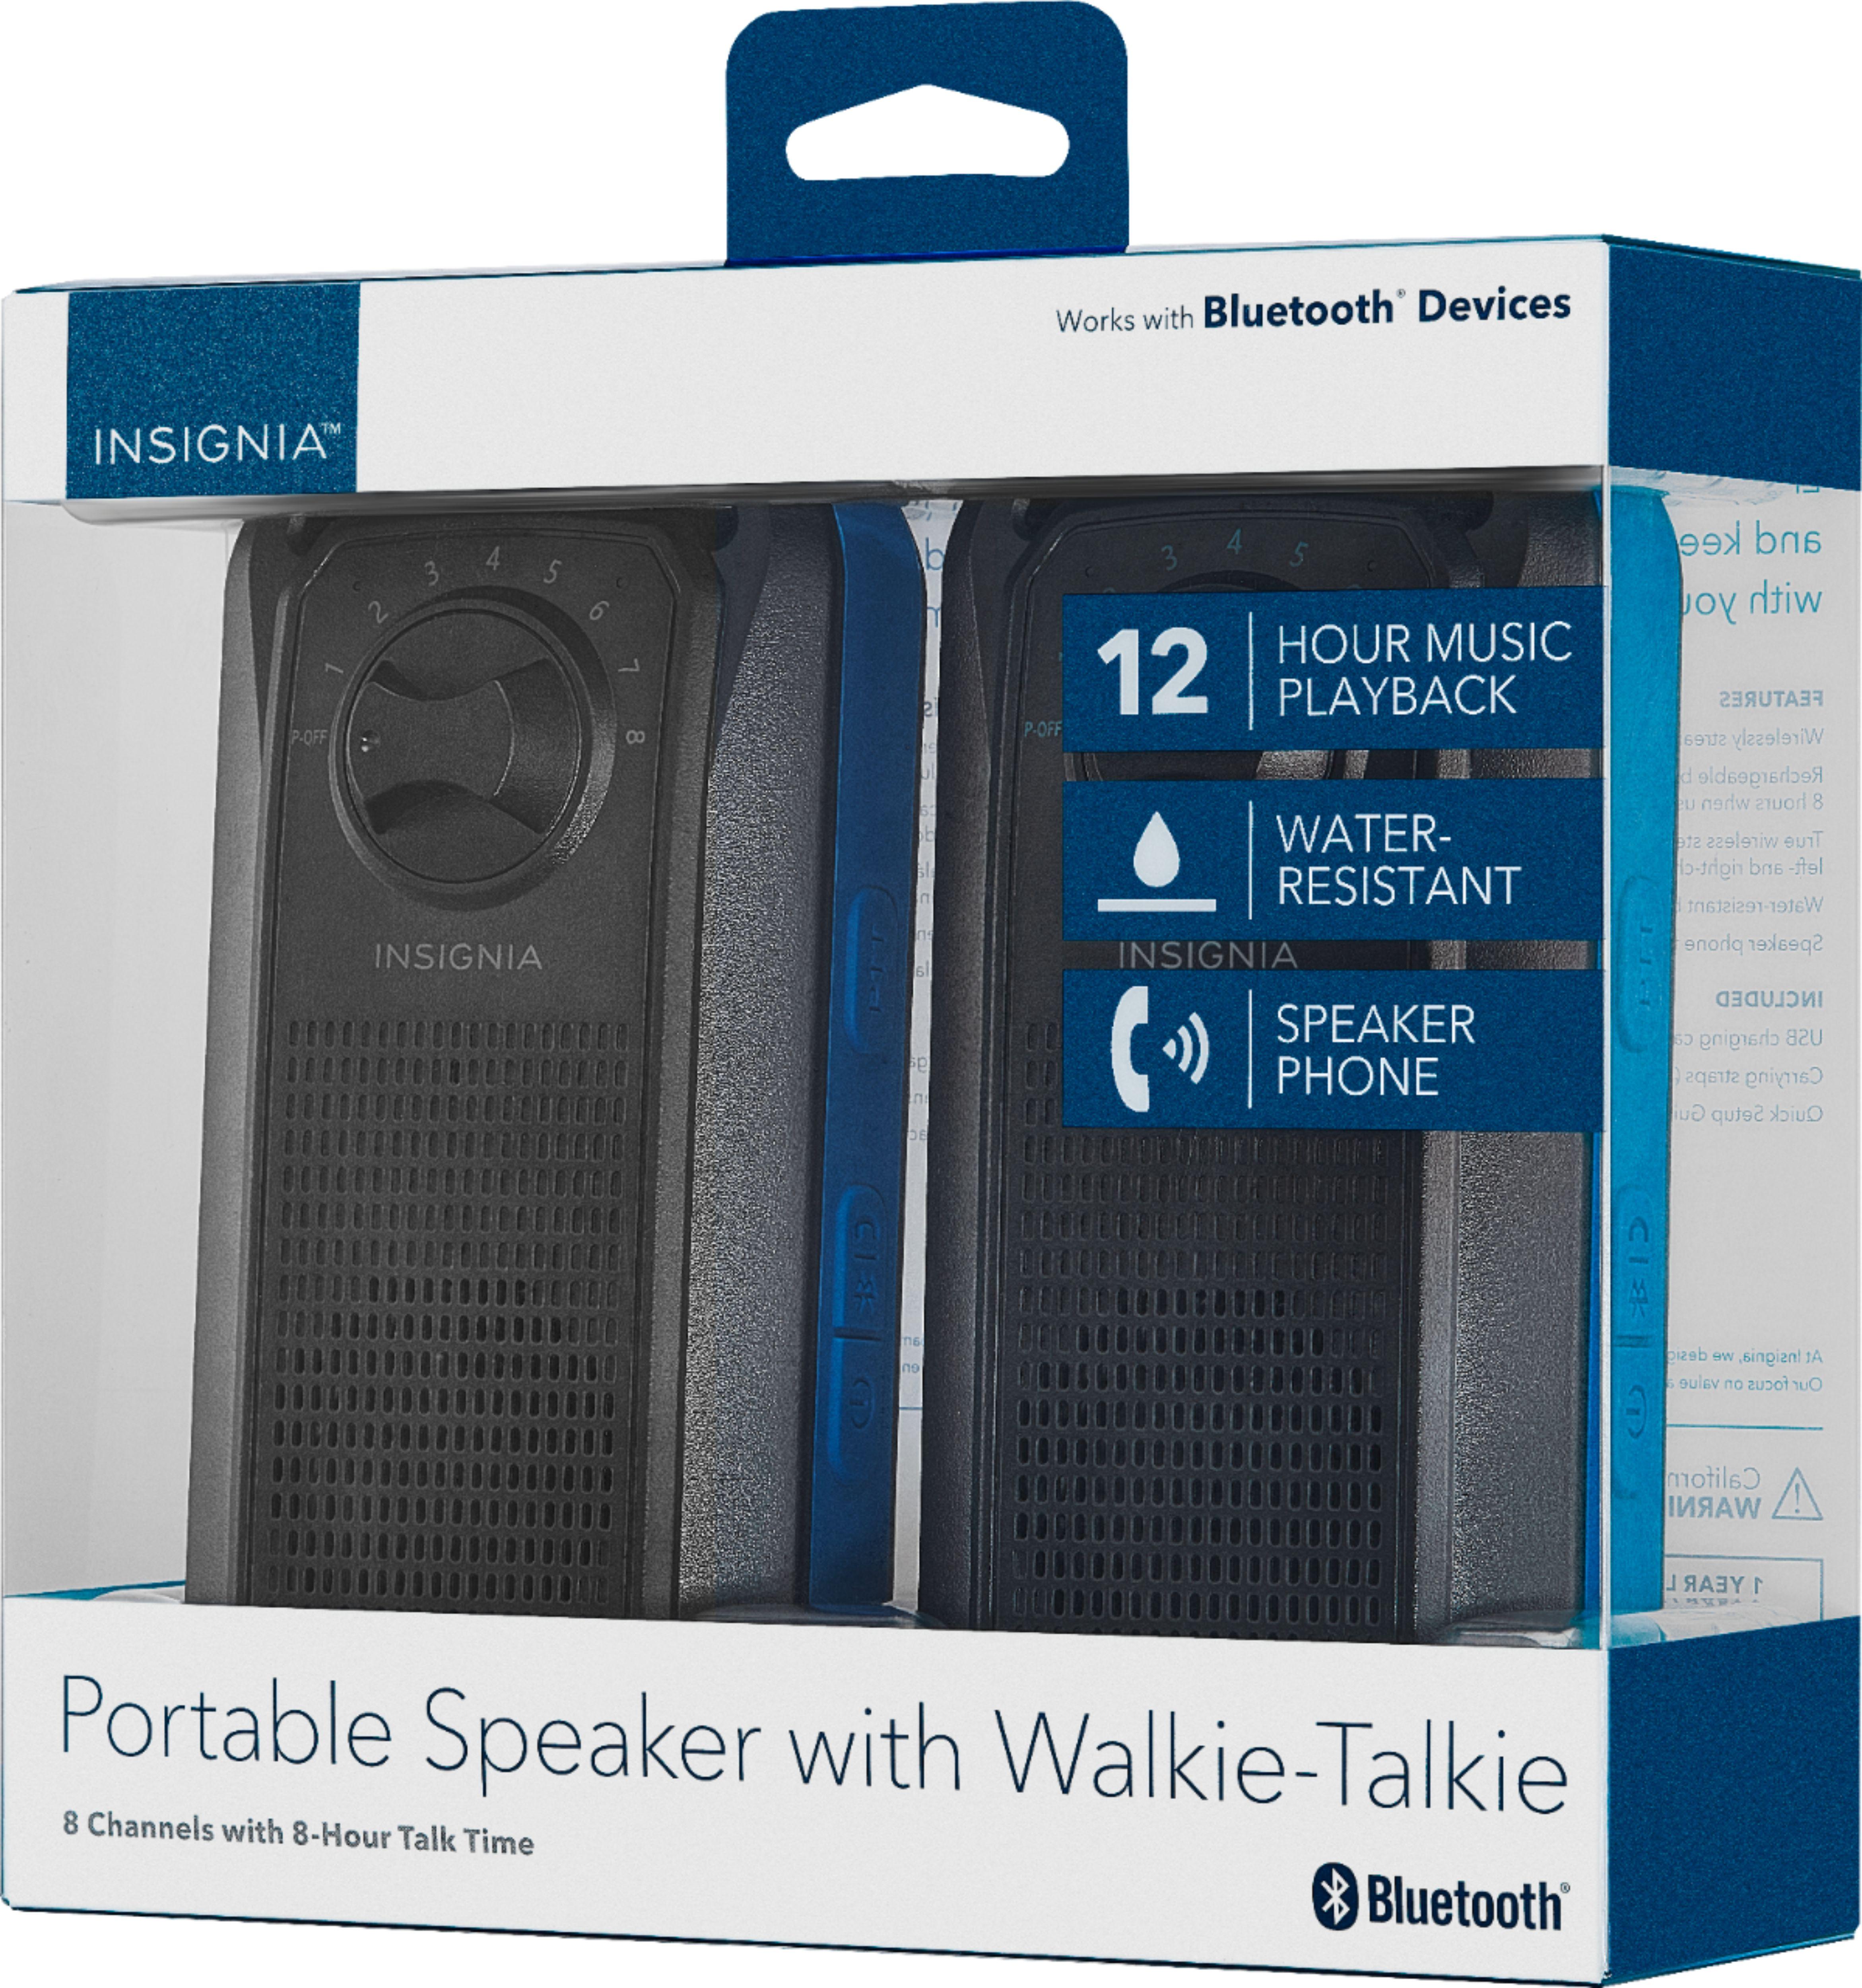 Insignia™ - Portable Speaker with Walkie-Talkie - Black $19 99